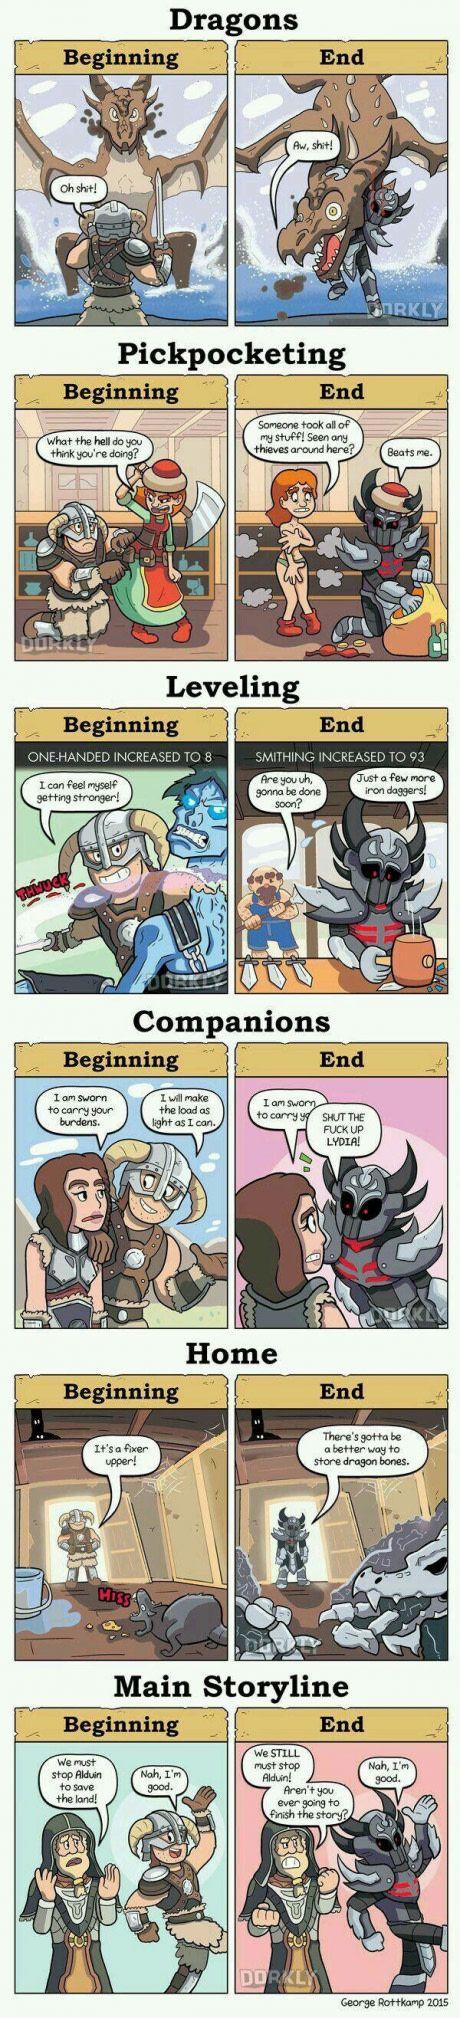 Skyrim: Beginning and End